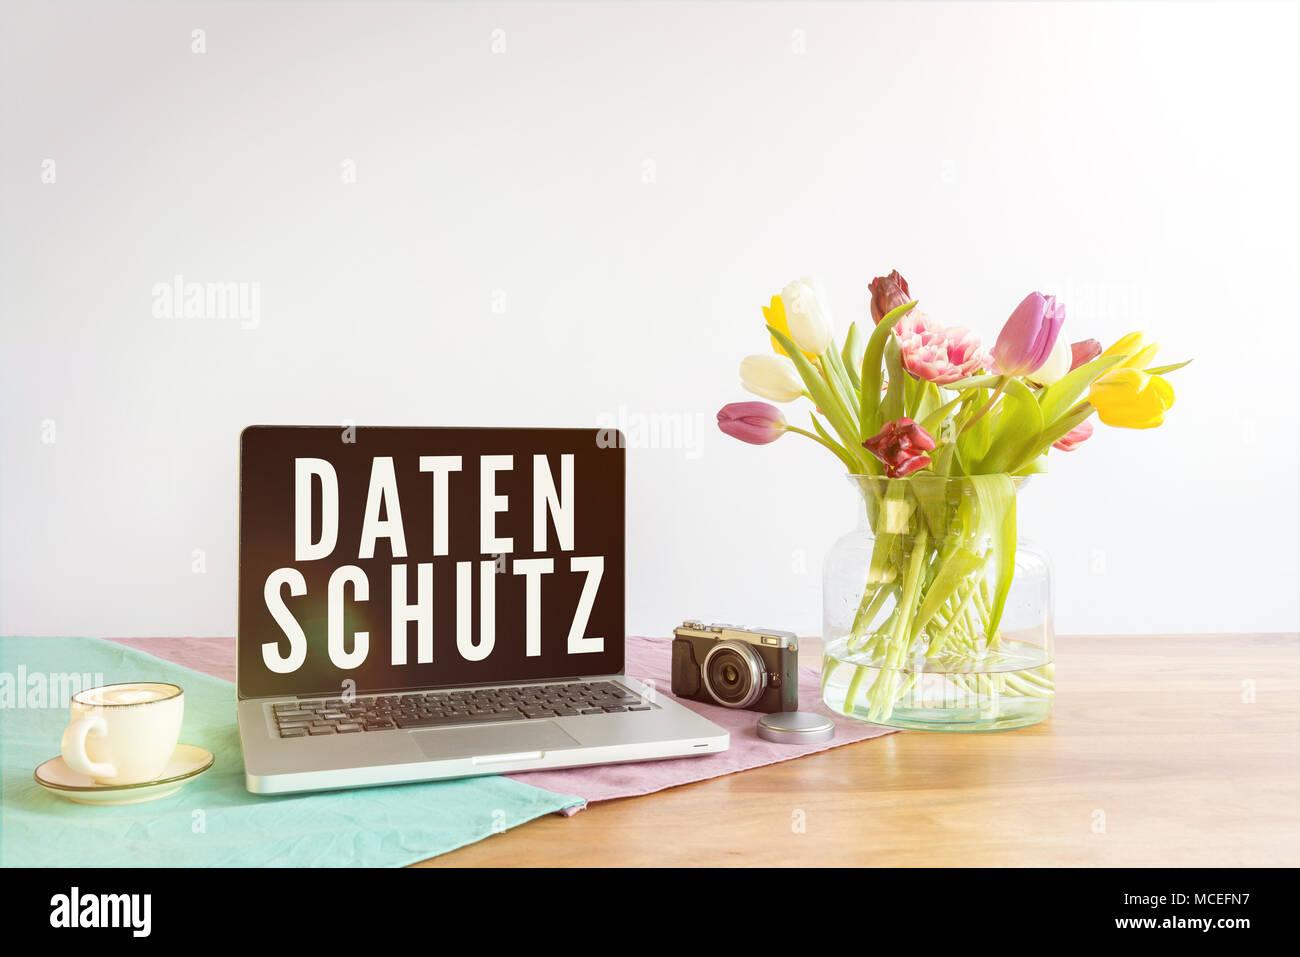 German word datenschutz written on laptop screen meaning data german word datenschutz written on laptop screen meaning data privacy in english on wooden office desk with flowers in front of white background malvernweather Gallery